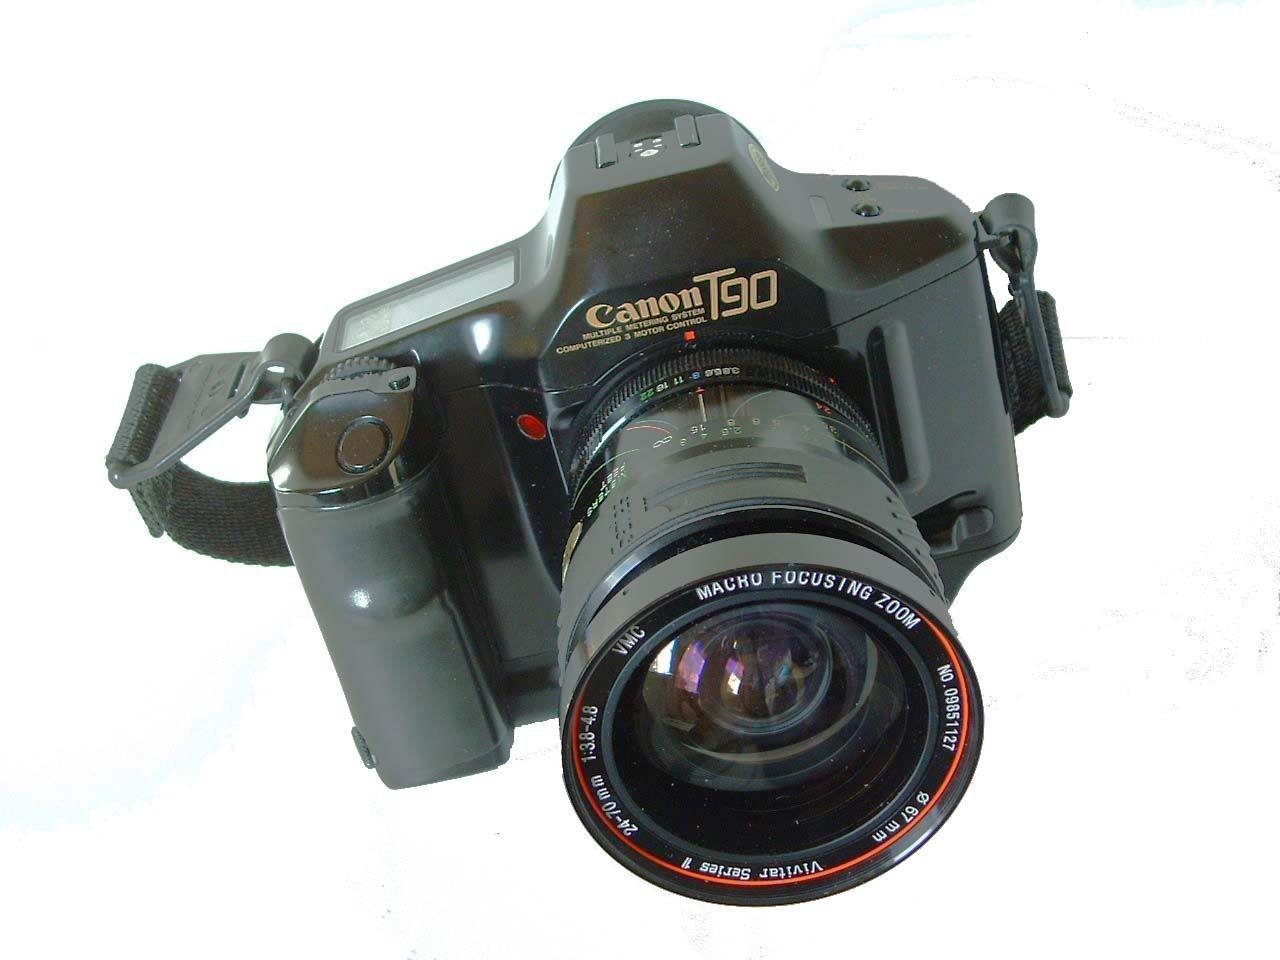 [Image: CanonT90.jpg]